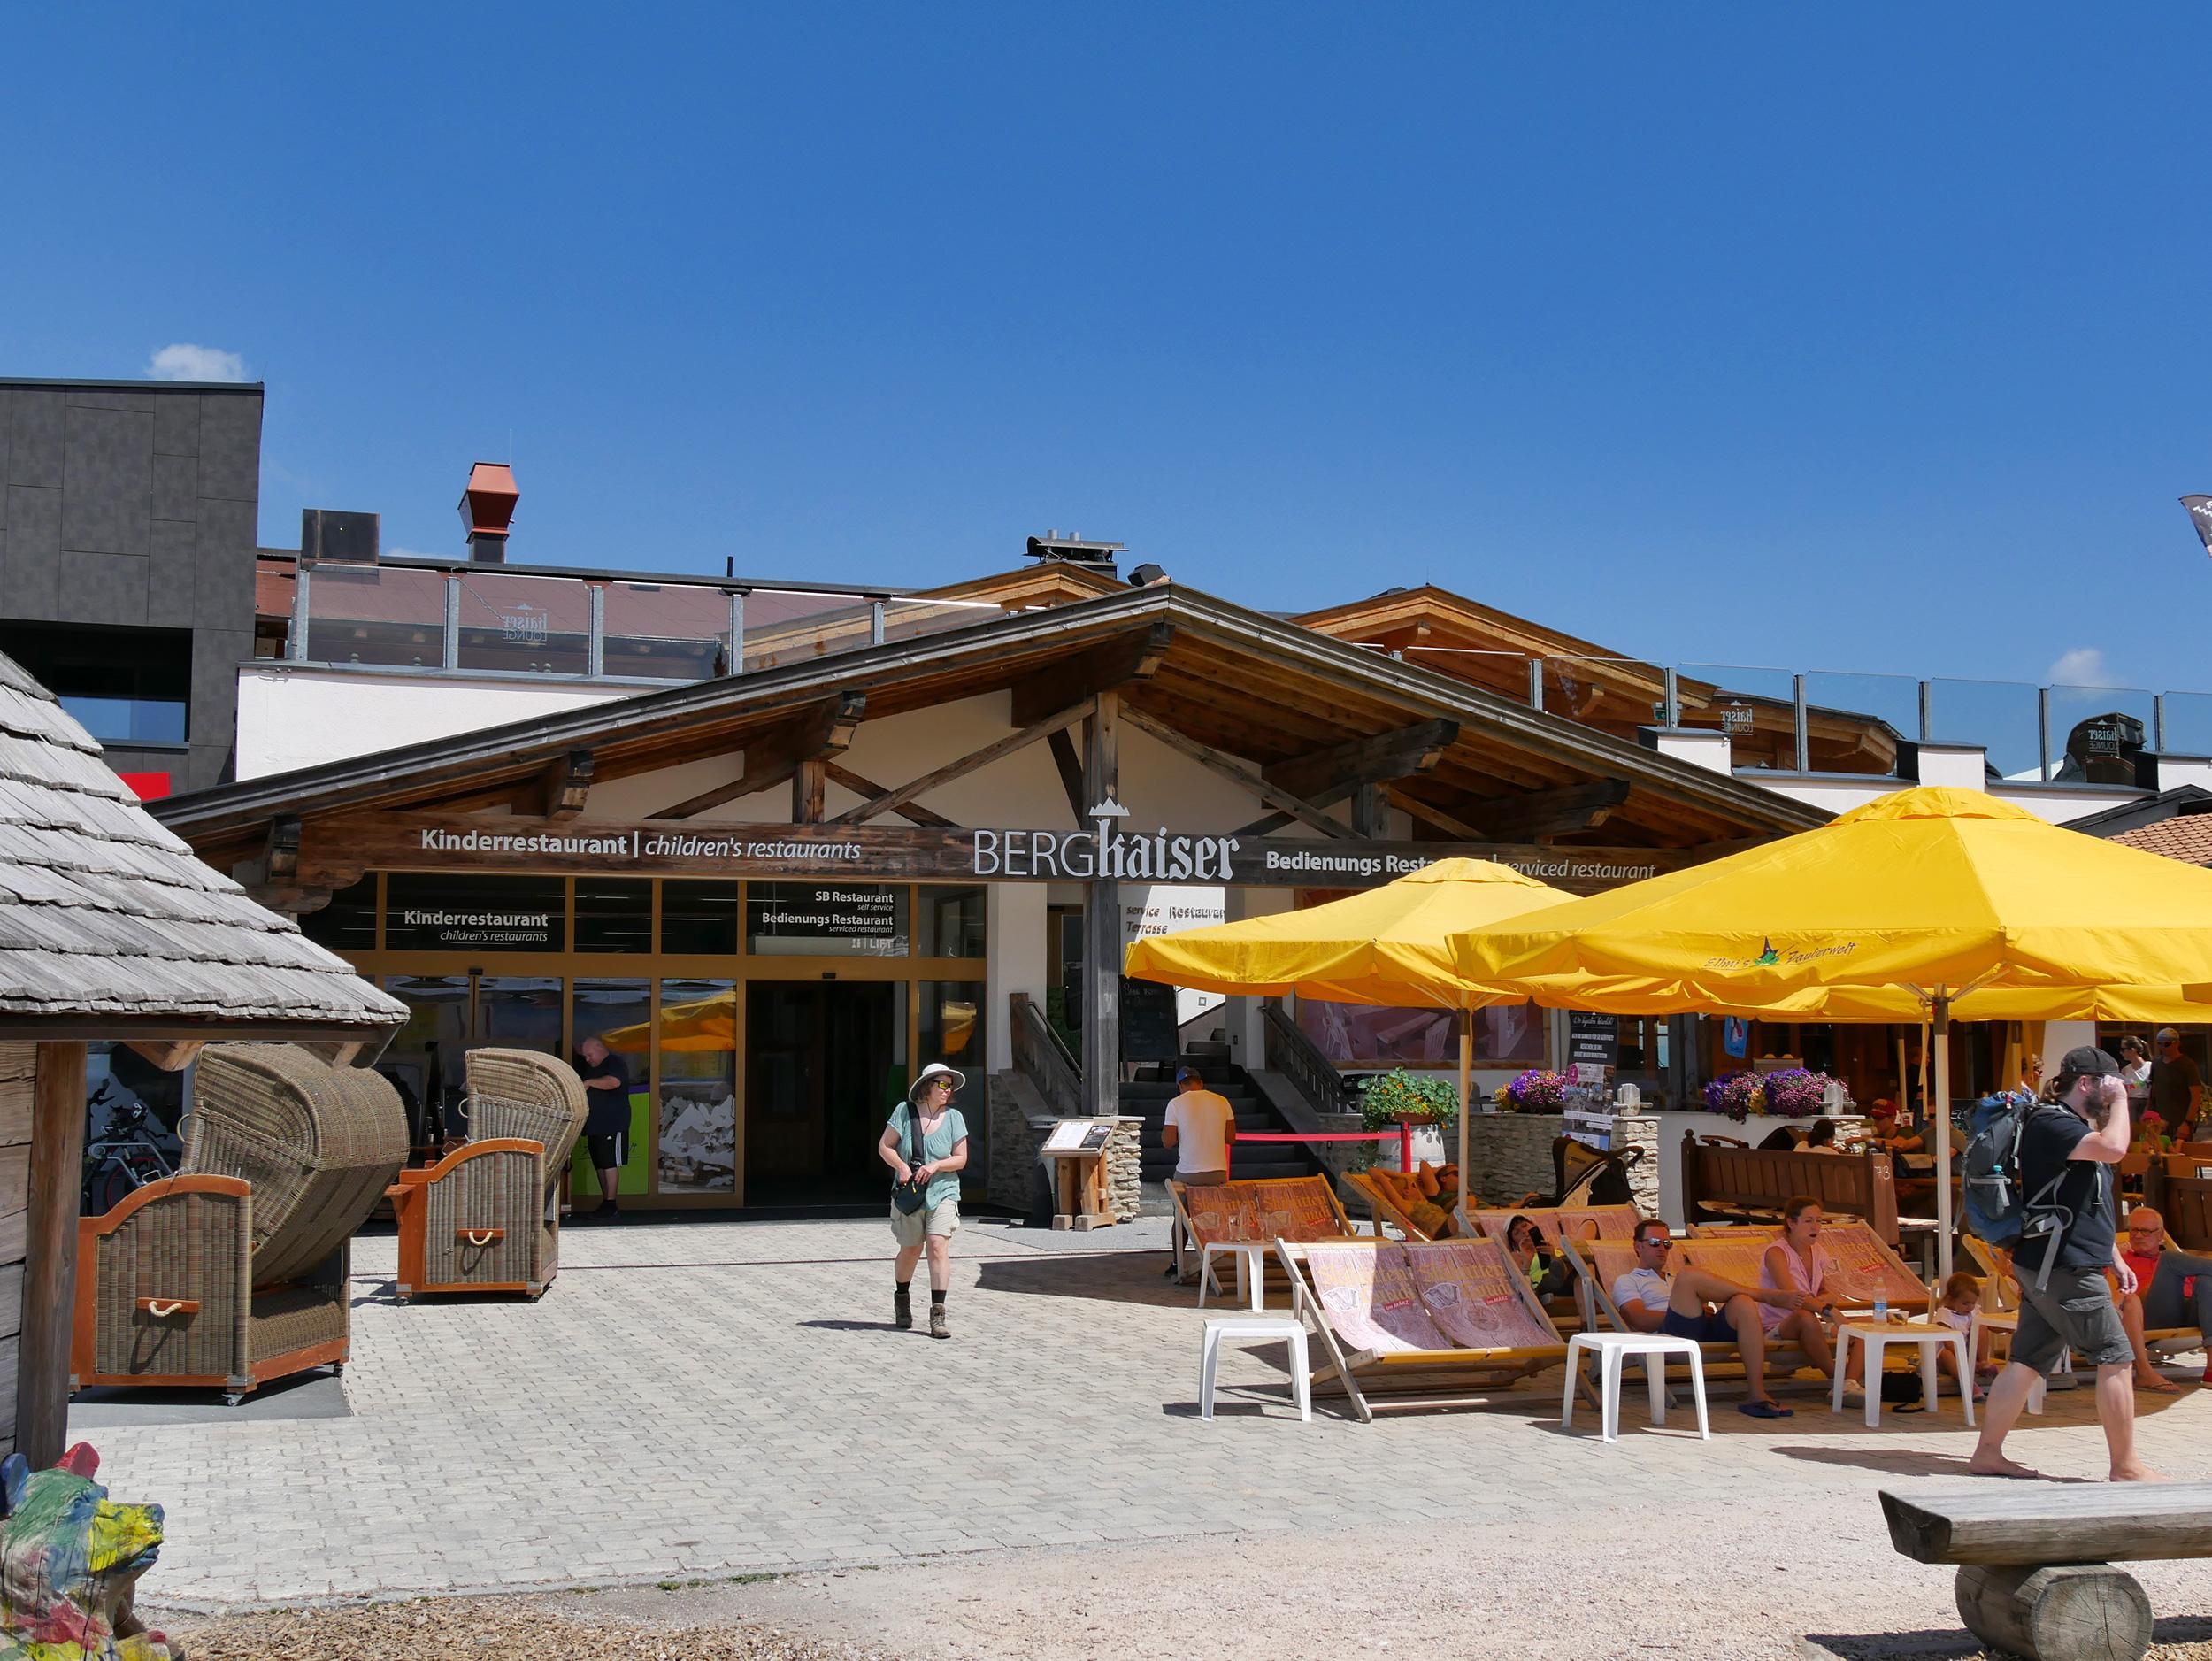 Bergrestaurant Bergkaiser – © Christian Schön